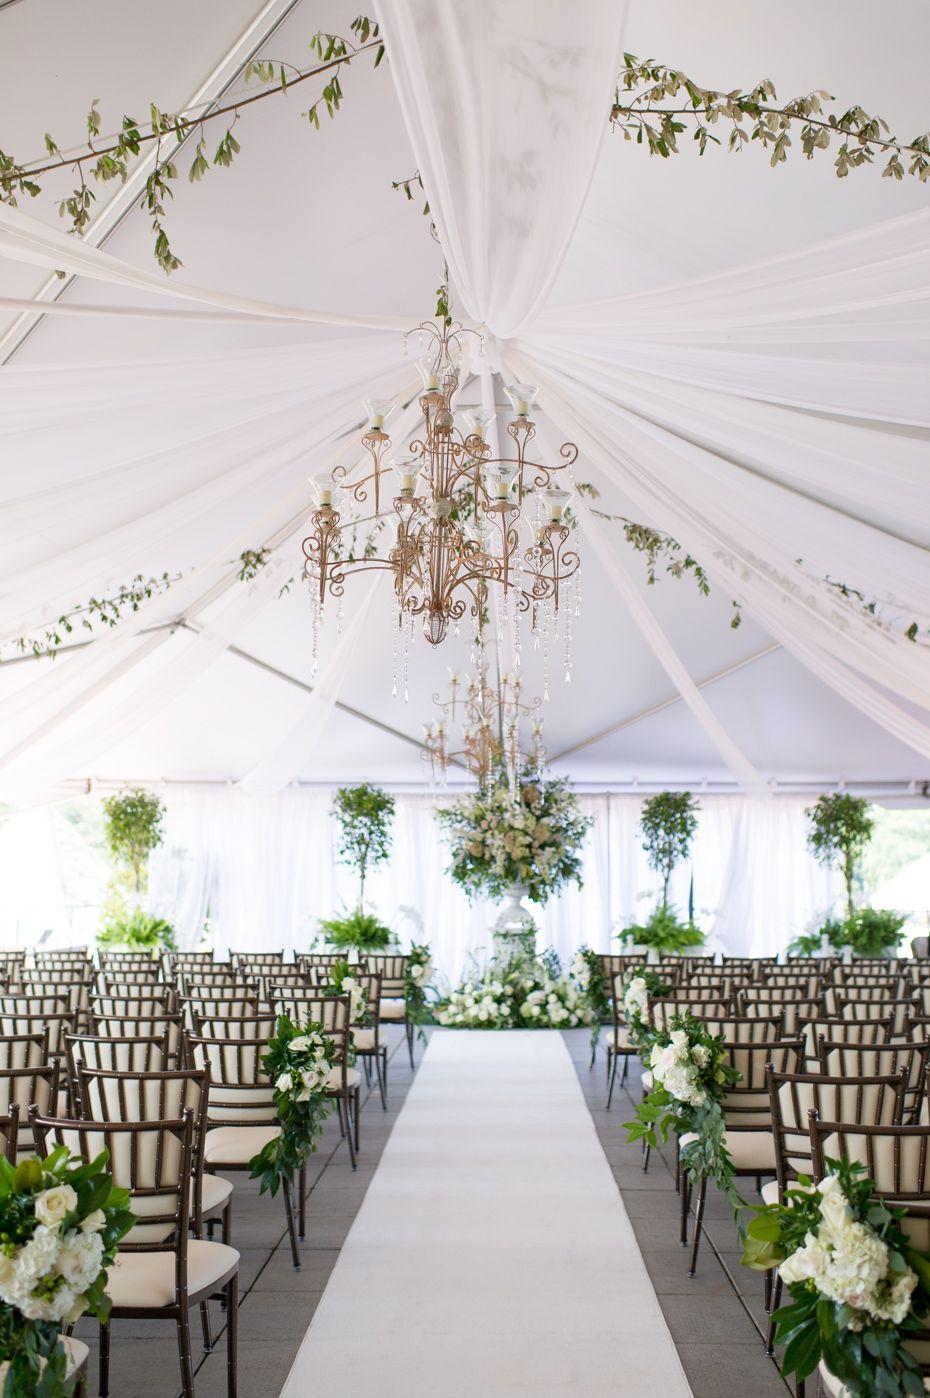 wedding reception venues woodstock ga%0A    Best images about Wedding Ideas on Pinterest   Gardens  Wedding venues  and Wedding